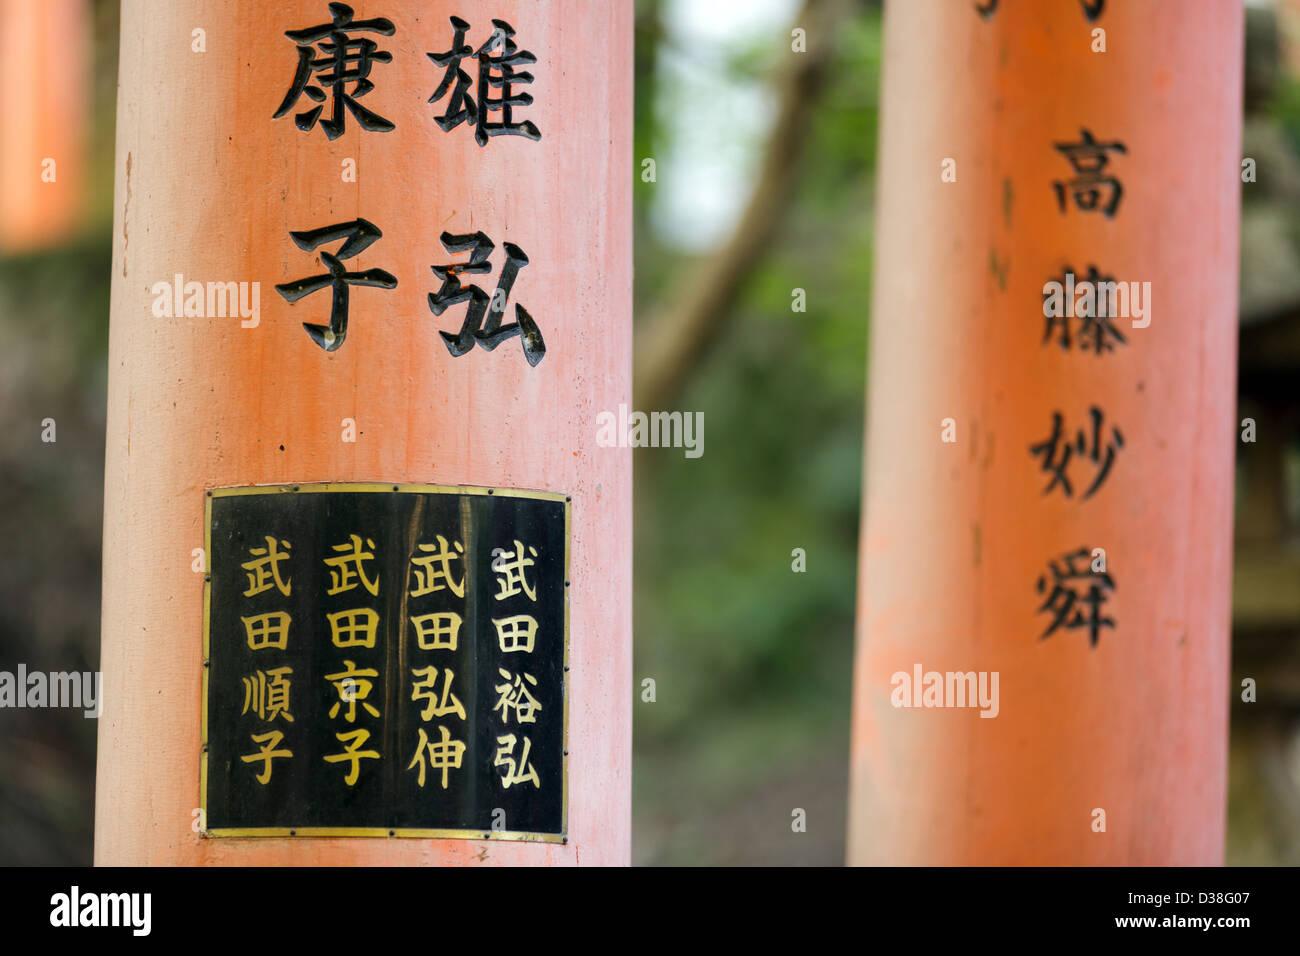 Kanji writings on fushimi Inari shrine torii in Kyoto, Japan - Stock Image